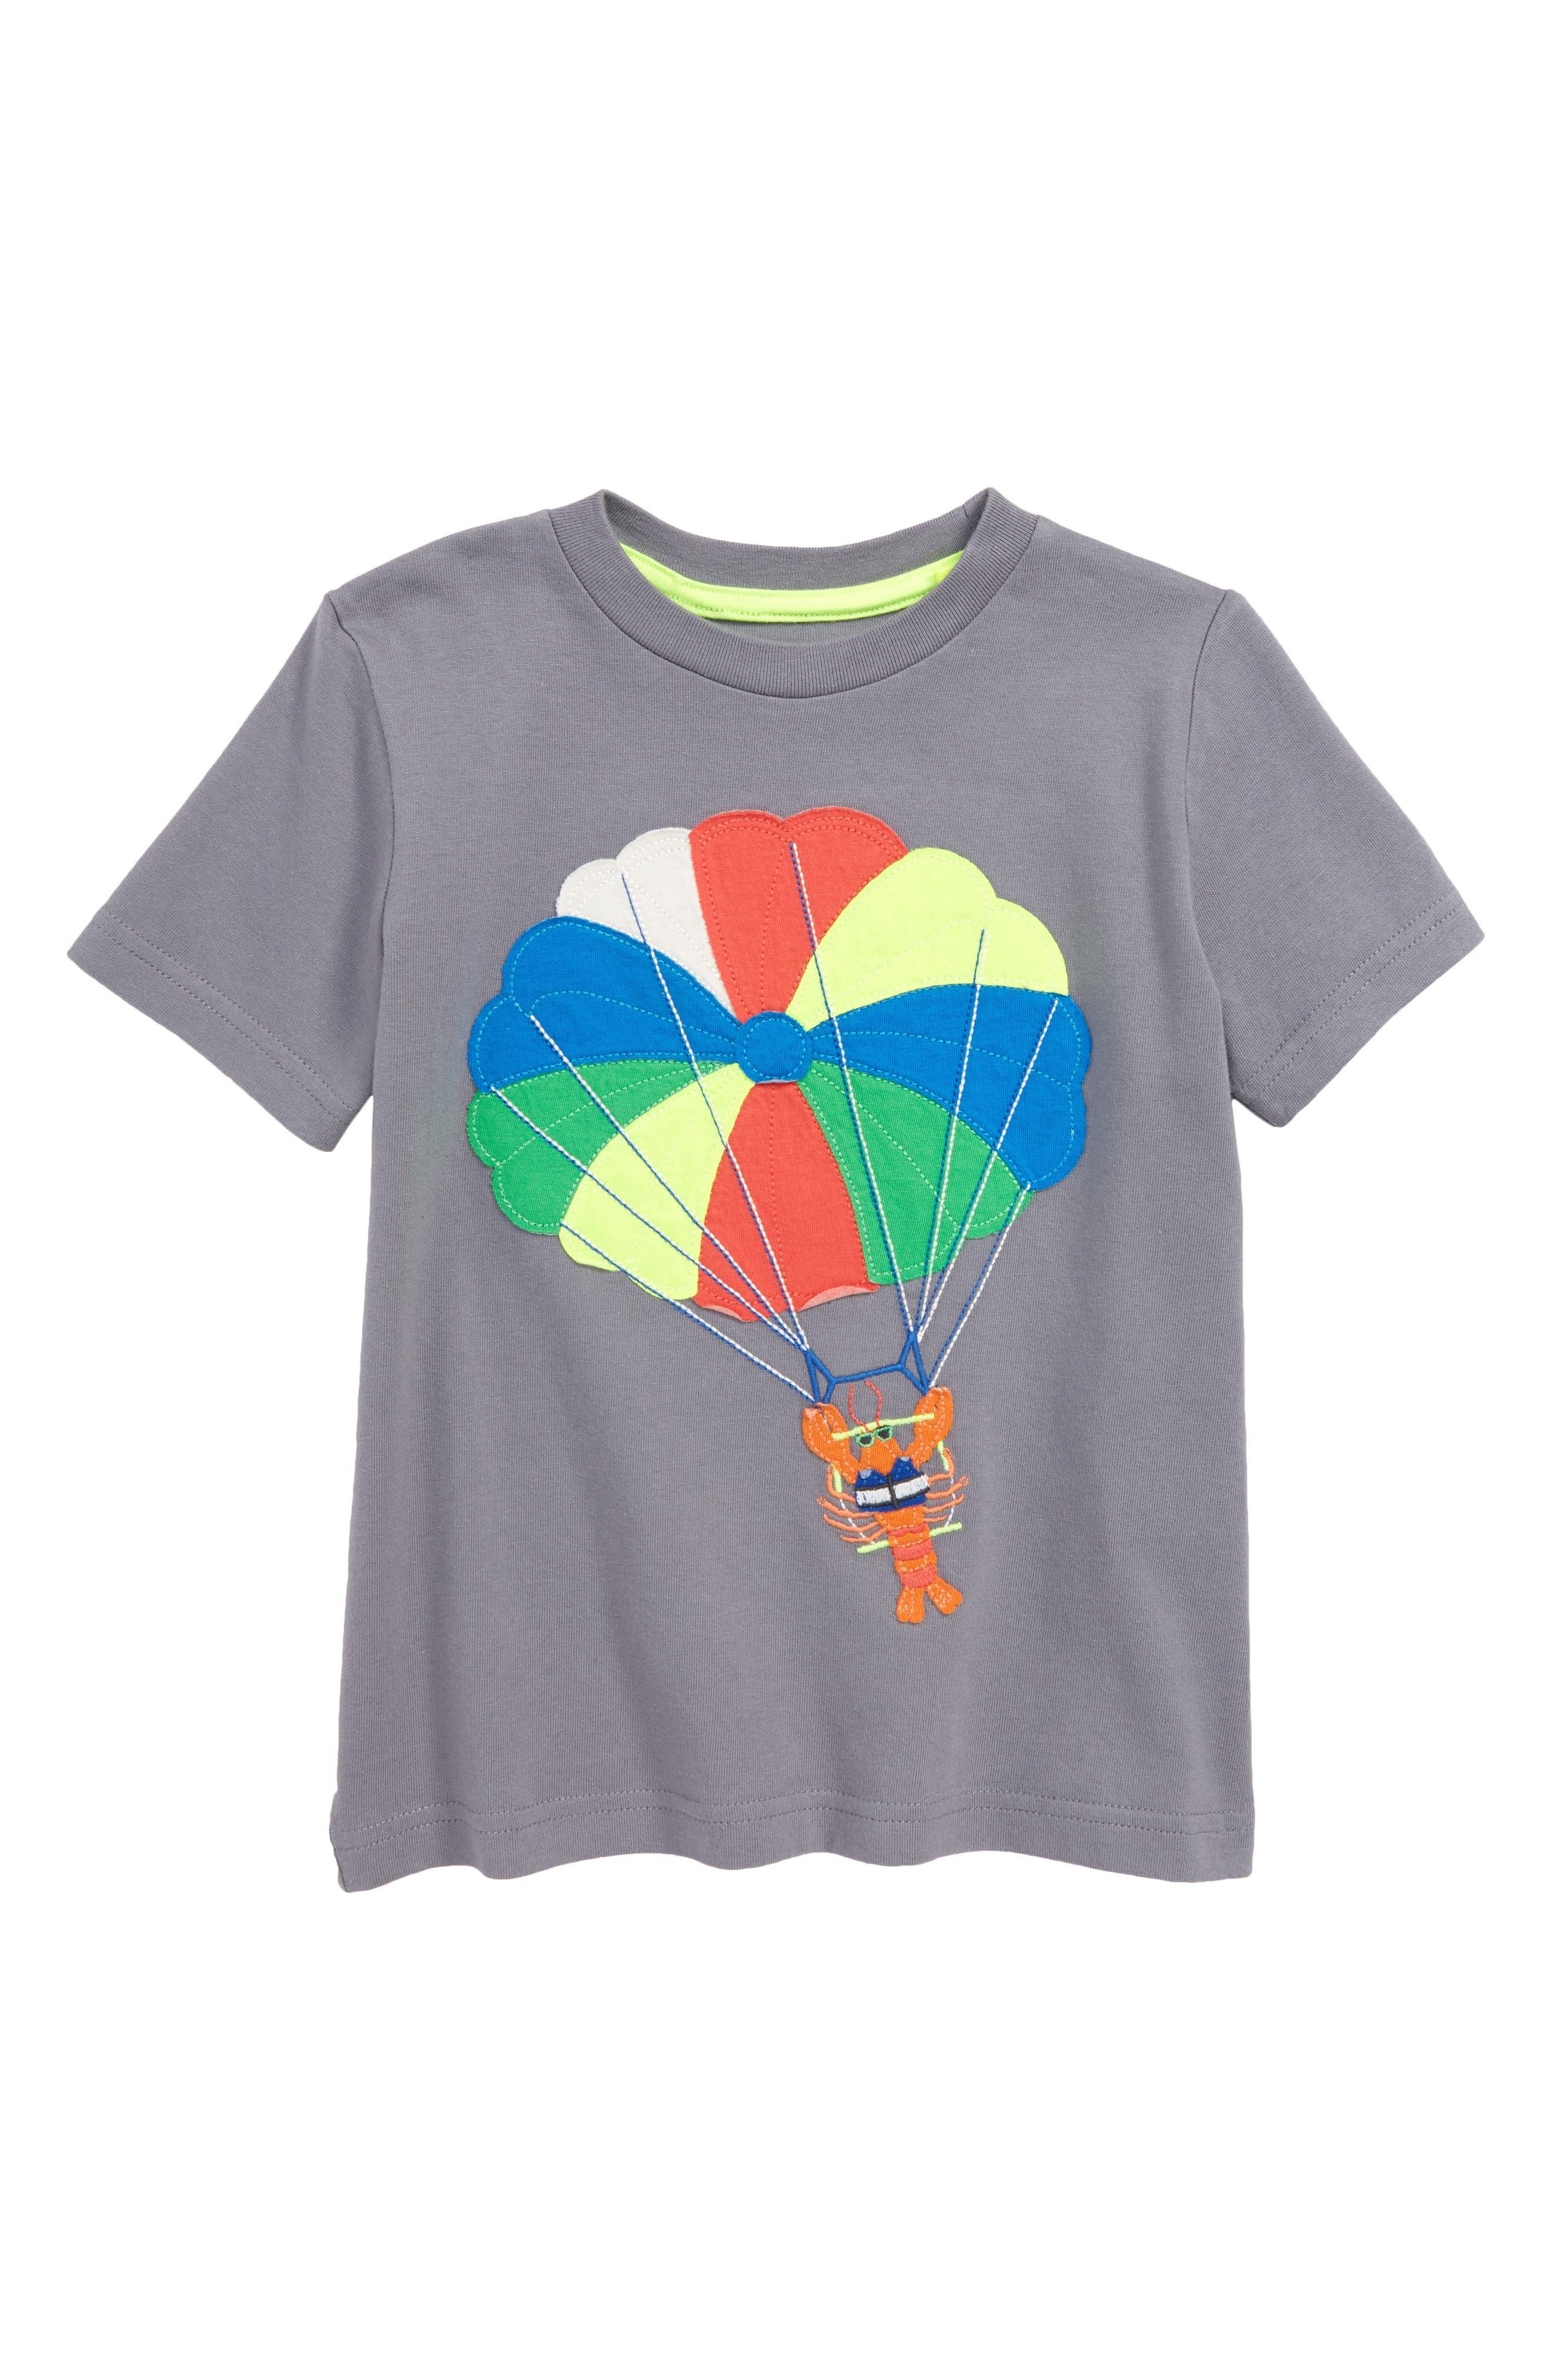 Beach Sports Appliqué Parasailing T-Shirt,                             Main thumbnail 1, color,                             062